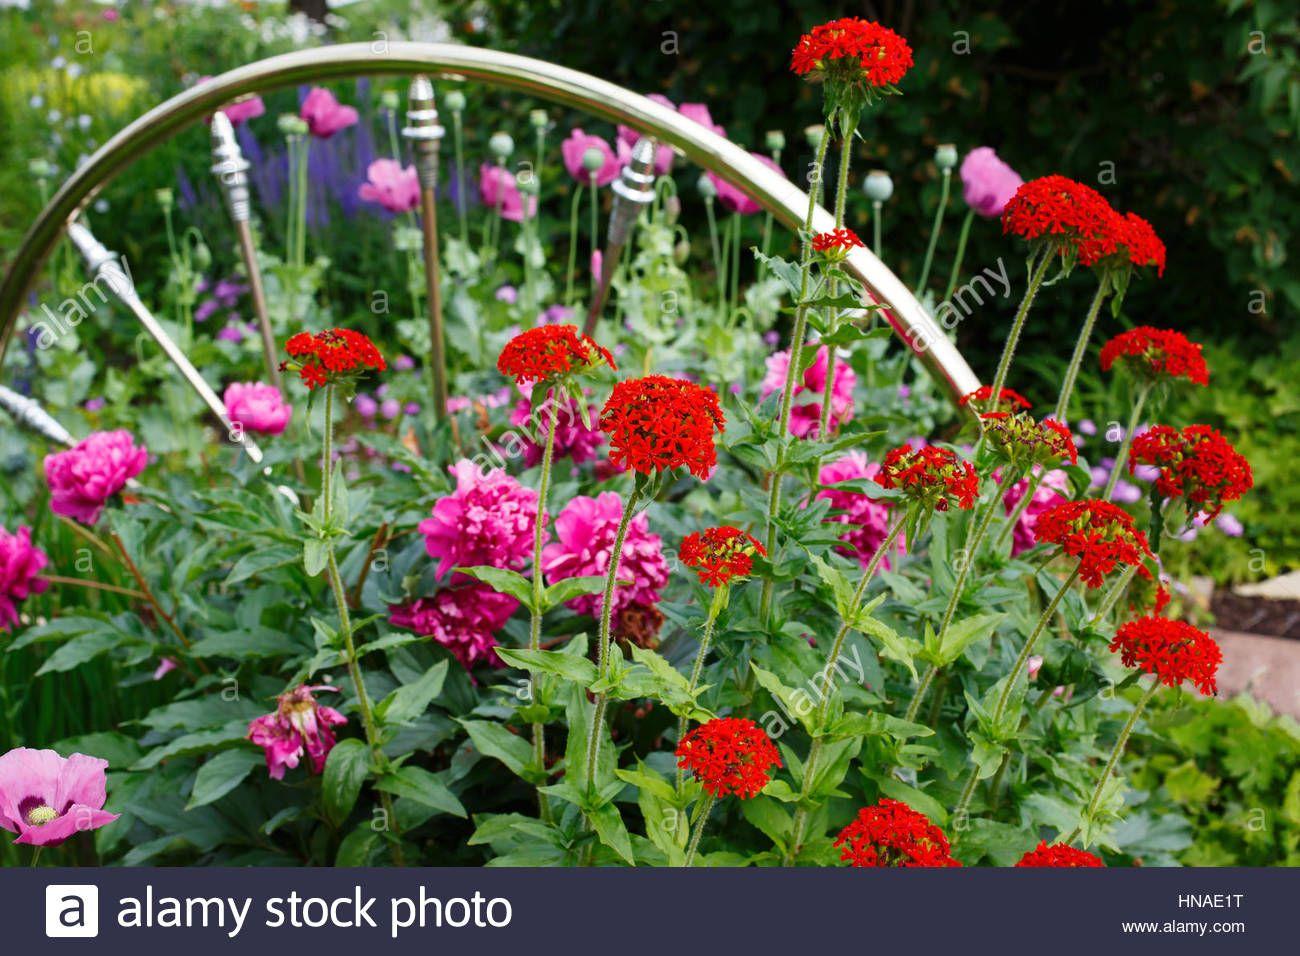 Flowering Maltese cross plants flowering in the summer